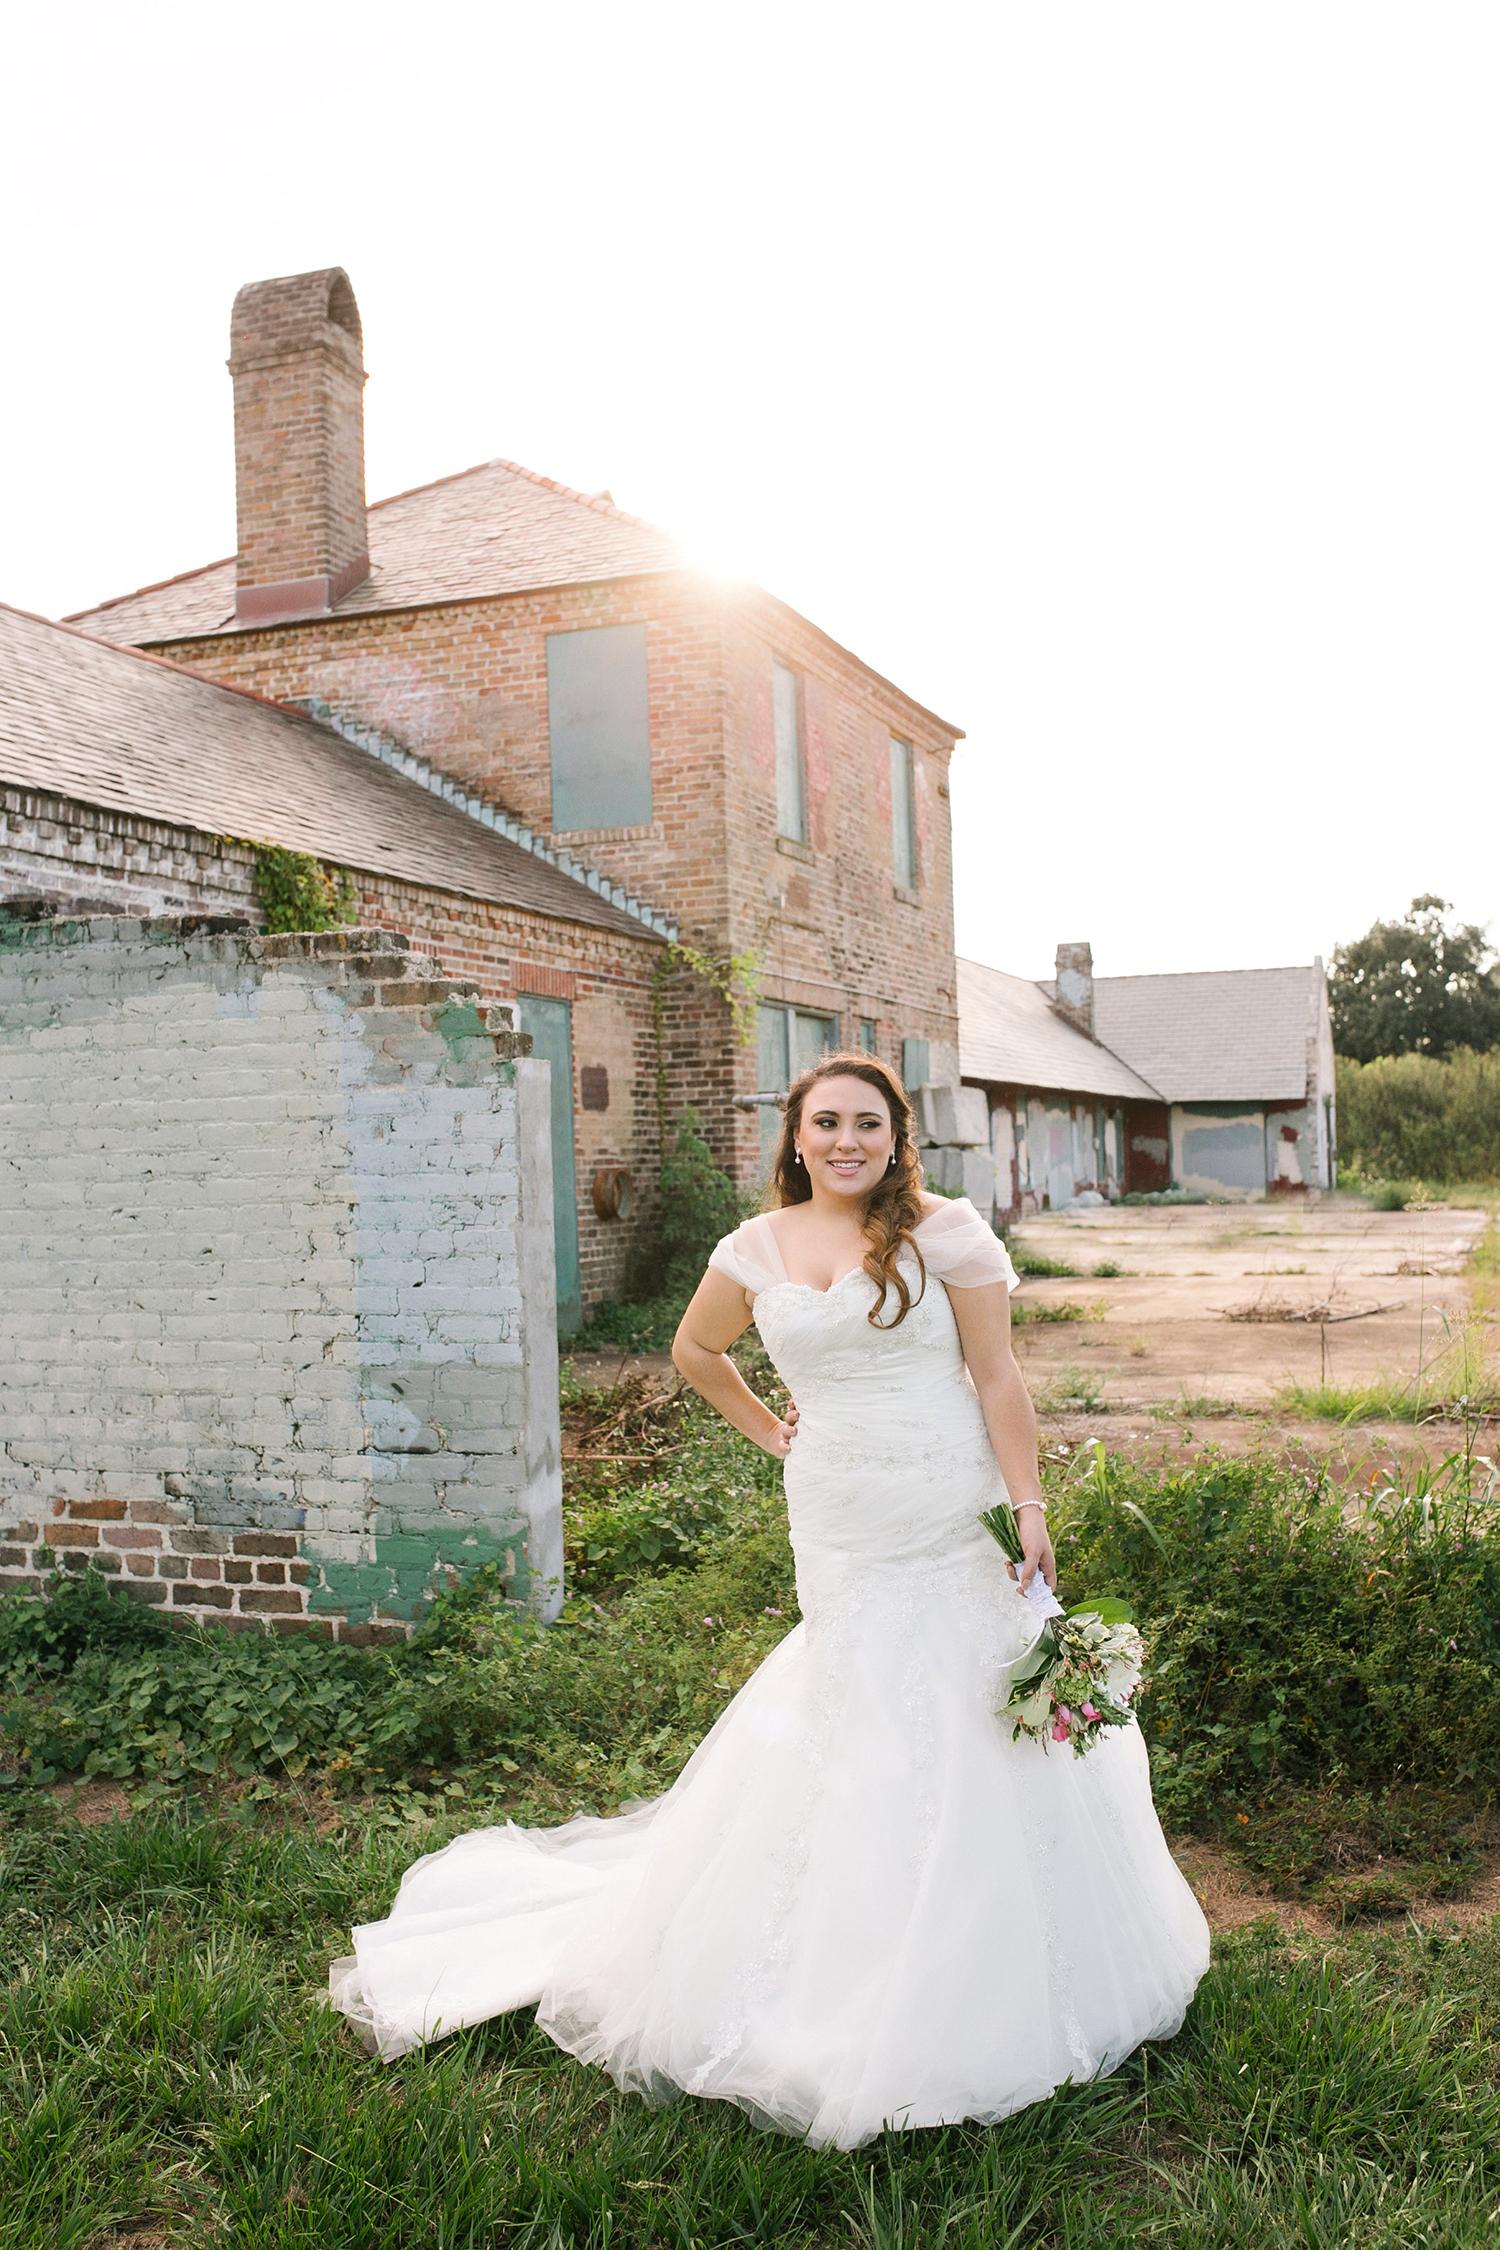 Gulfport-Wedding-Photographer-7.jpg